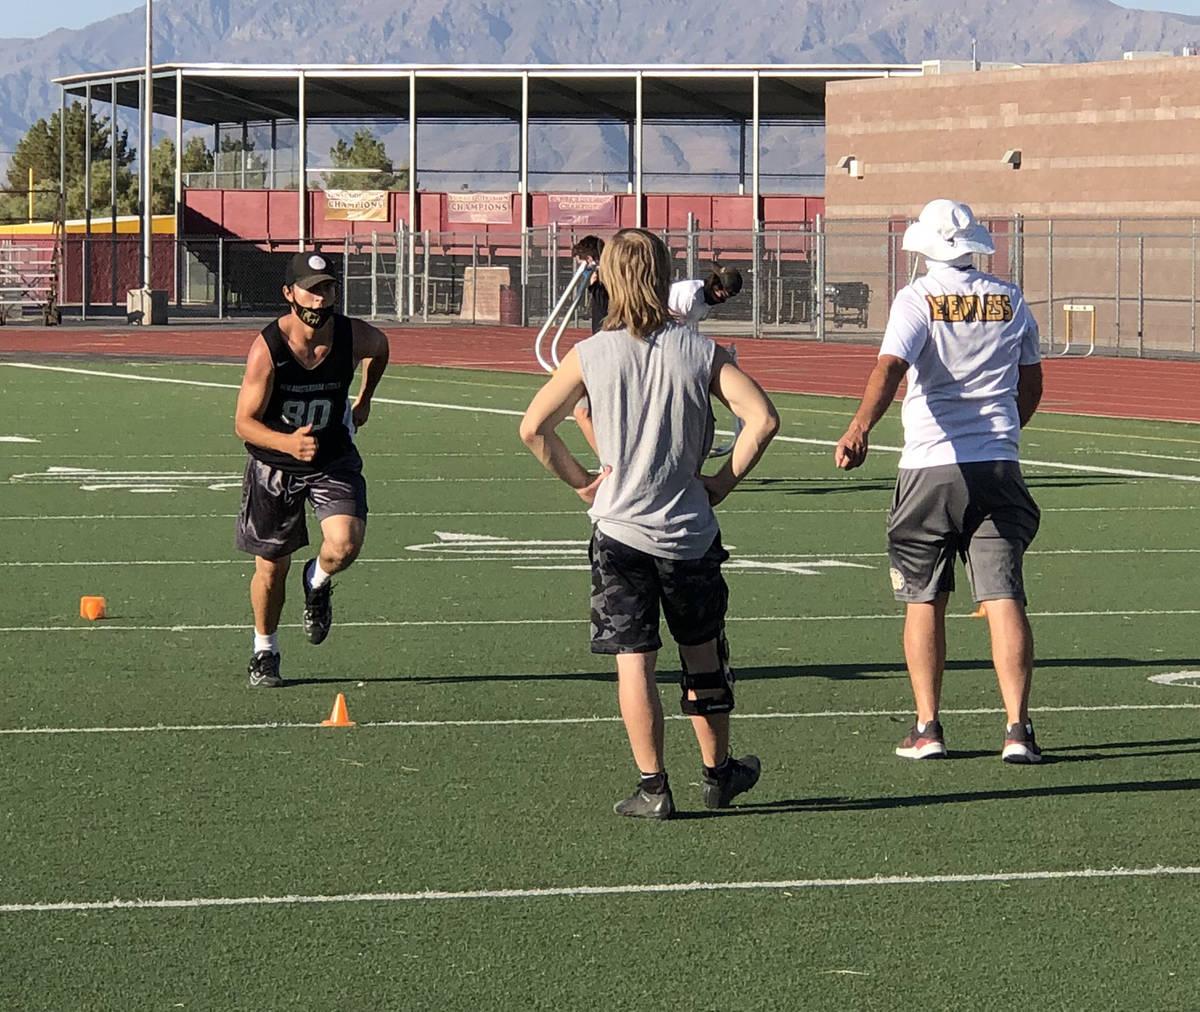 Tom Rysinski/Pahrump Valley Times Senior Tony Margiotta runs a drill as assistant coach Dan Nag ...